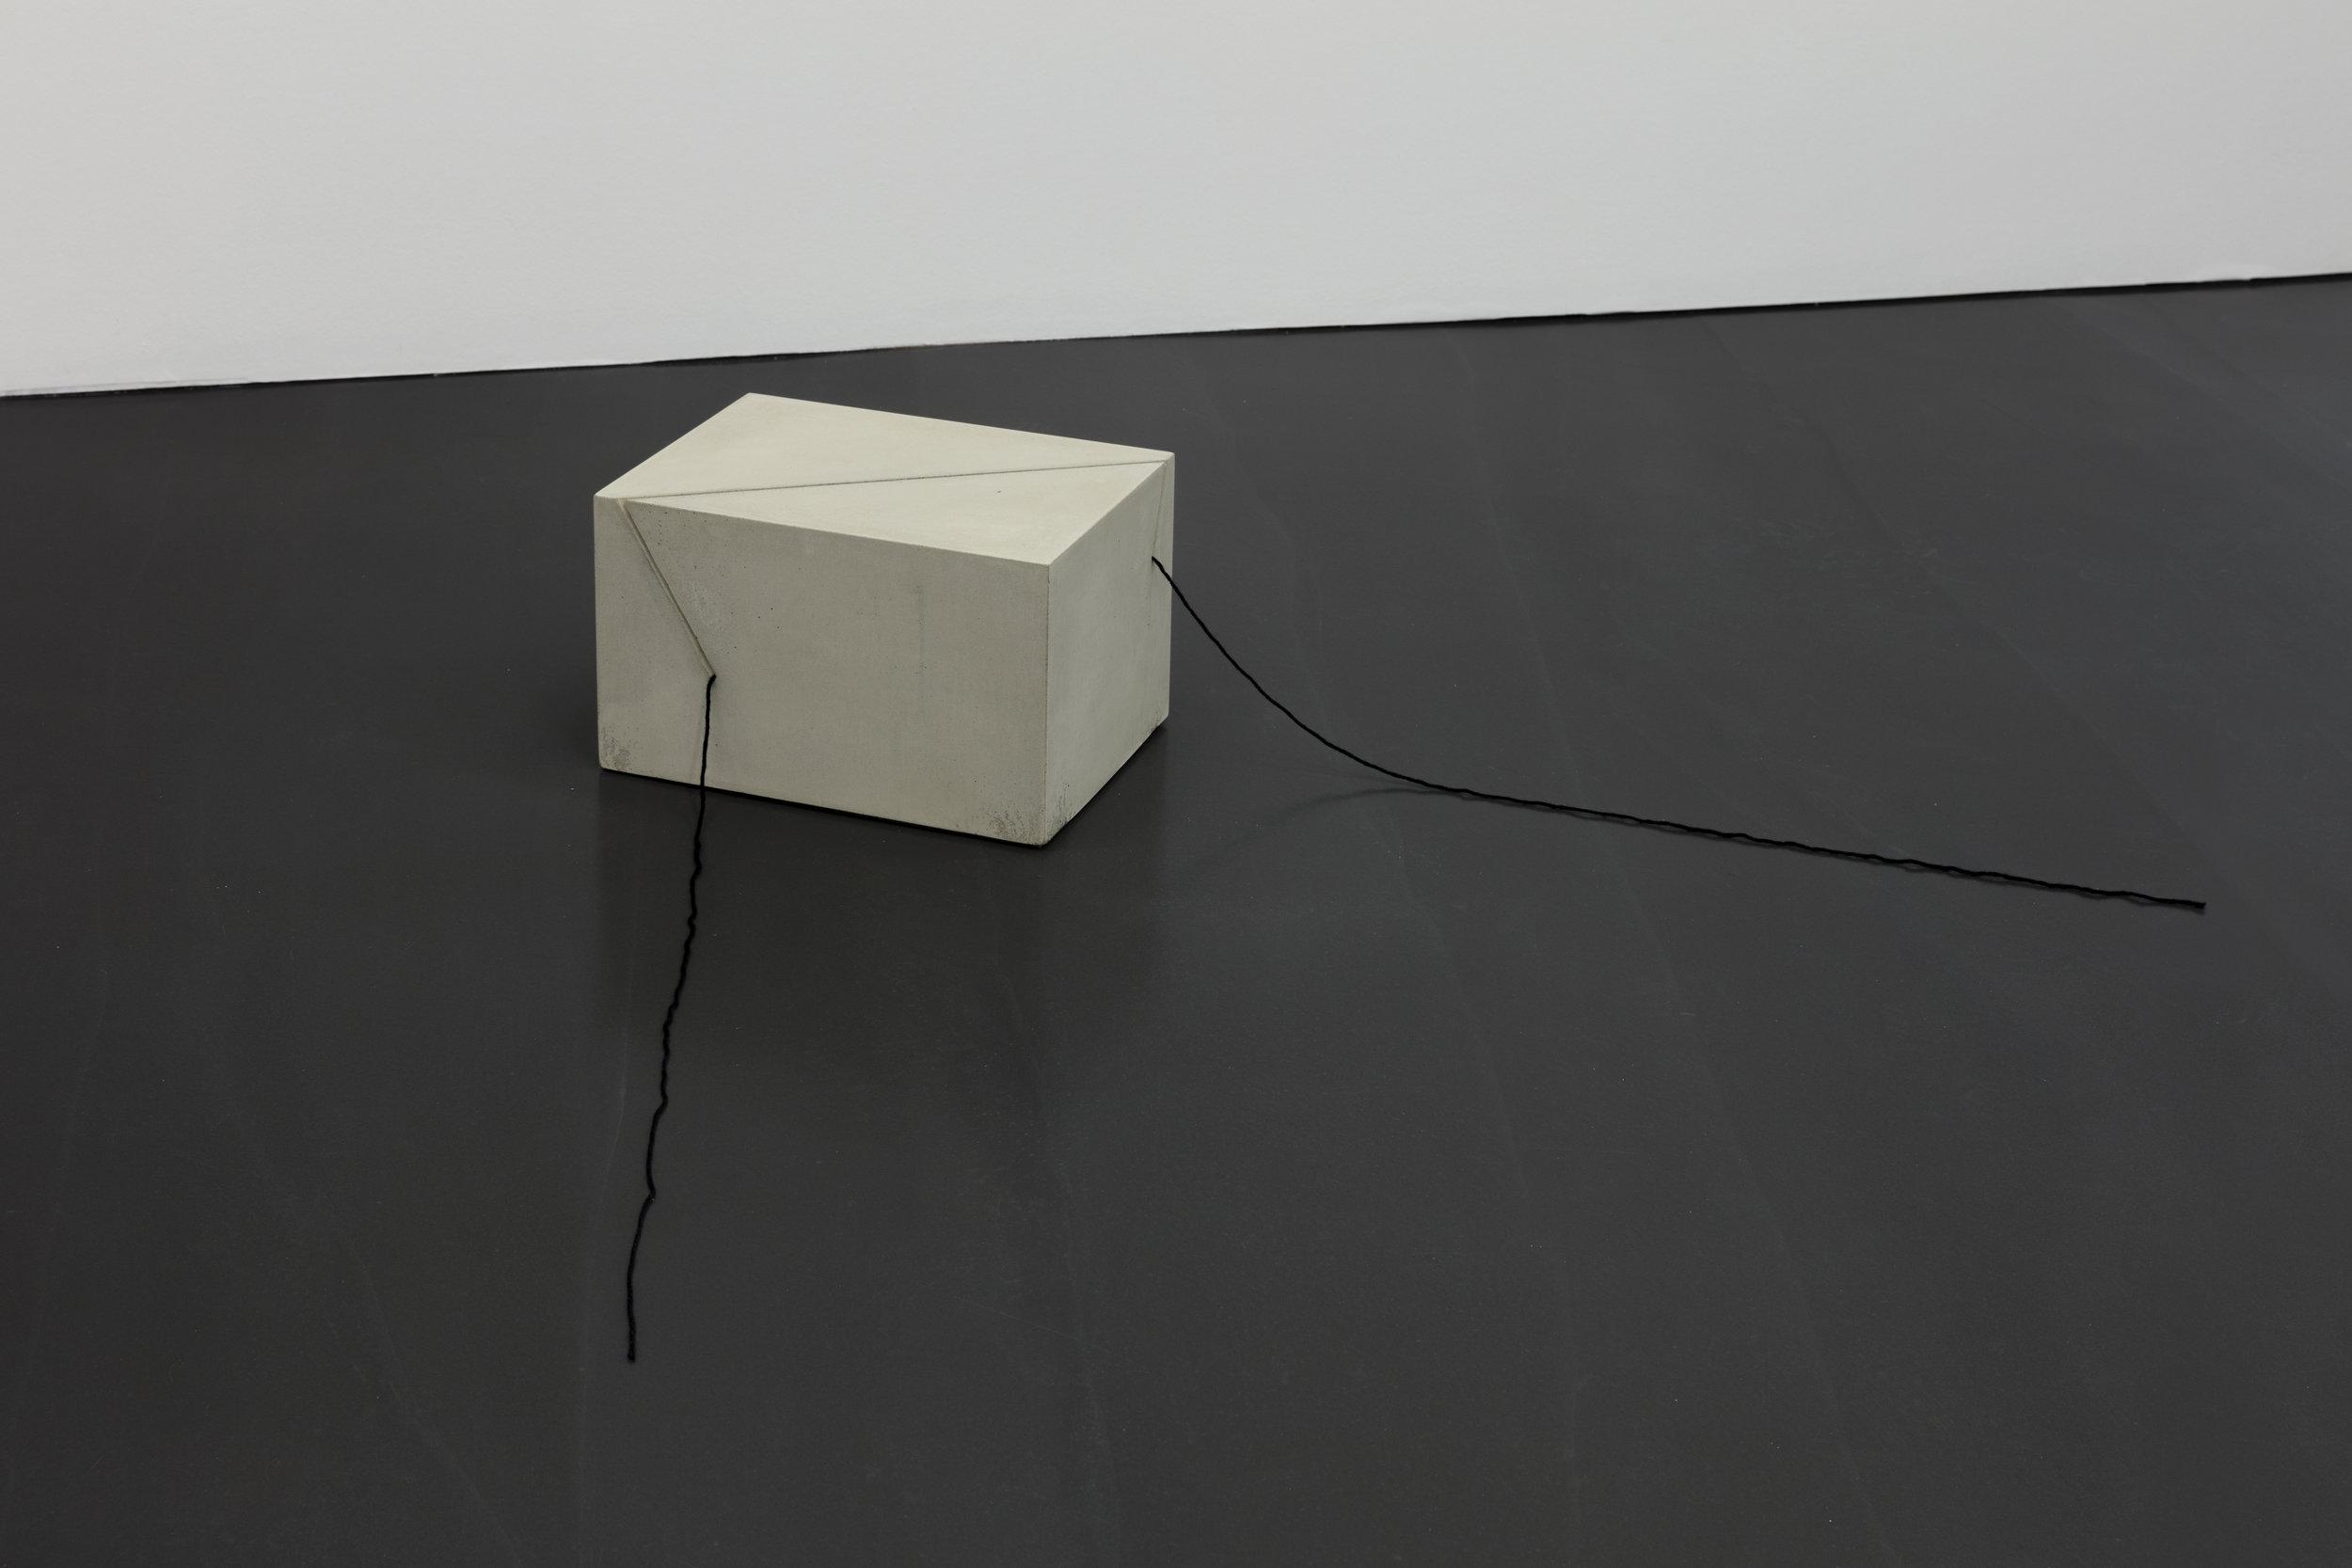 1. Line Weight II, Marcius Galan, 2018. Galeria Luisa Strina, São Paulo. Image: Andrea Rosetti. Courtesy of Galeria Luisa Strina.